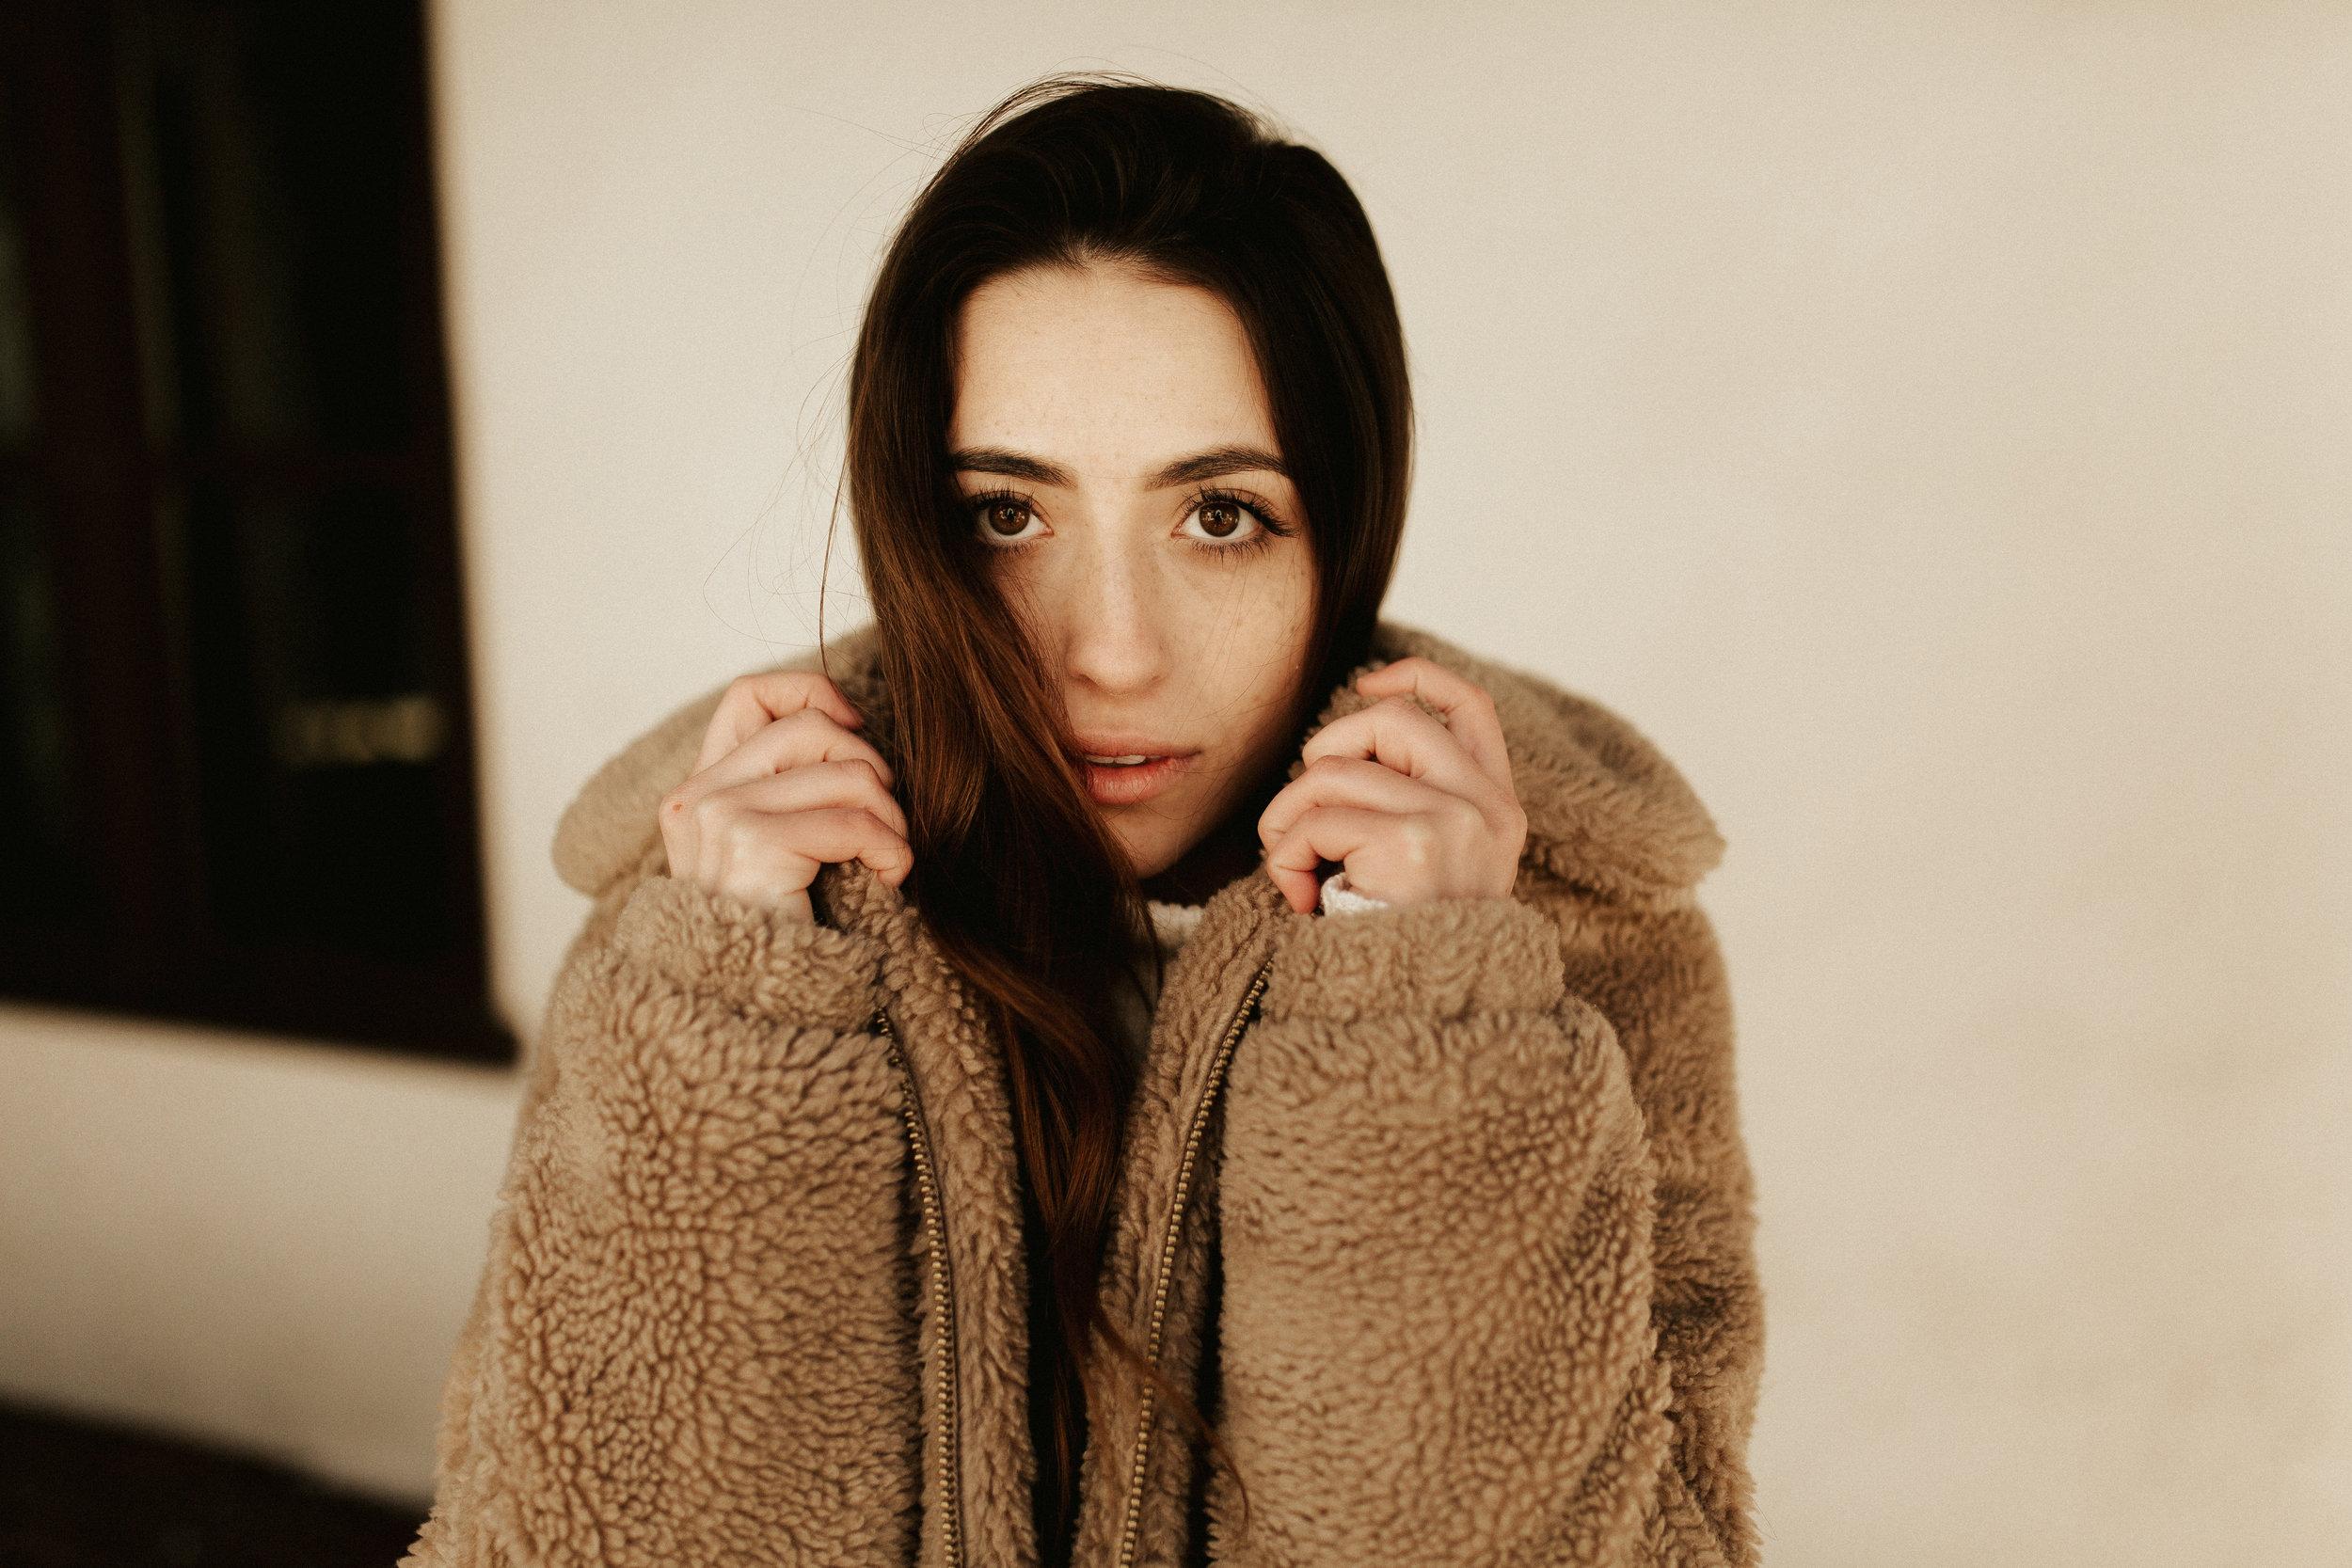 Arianna_Portraiture_79.jpg